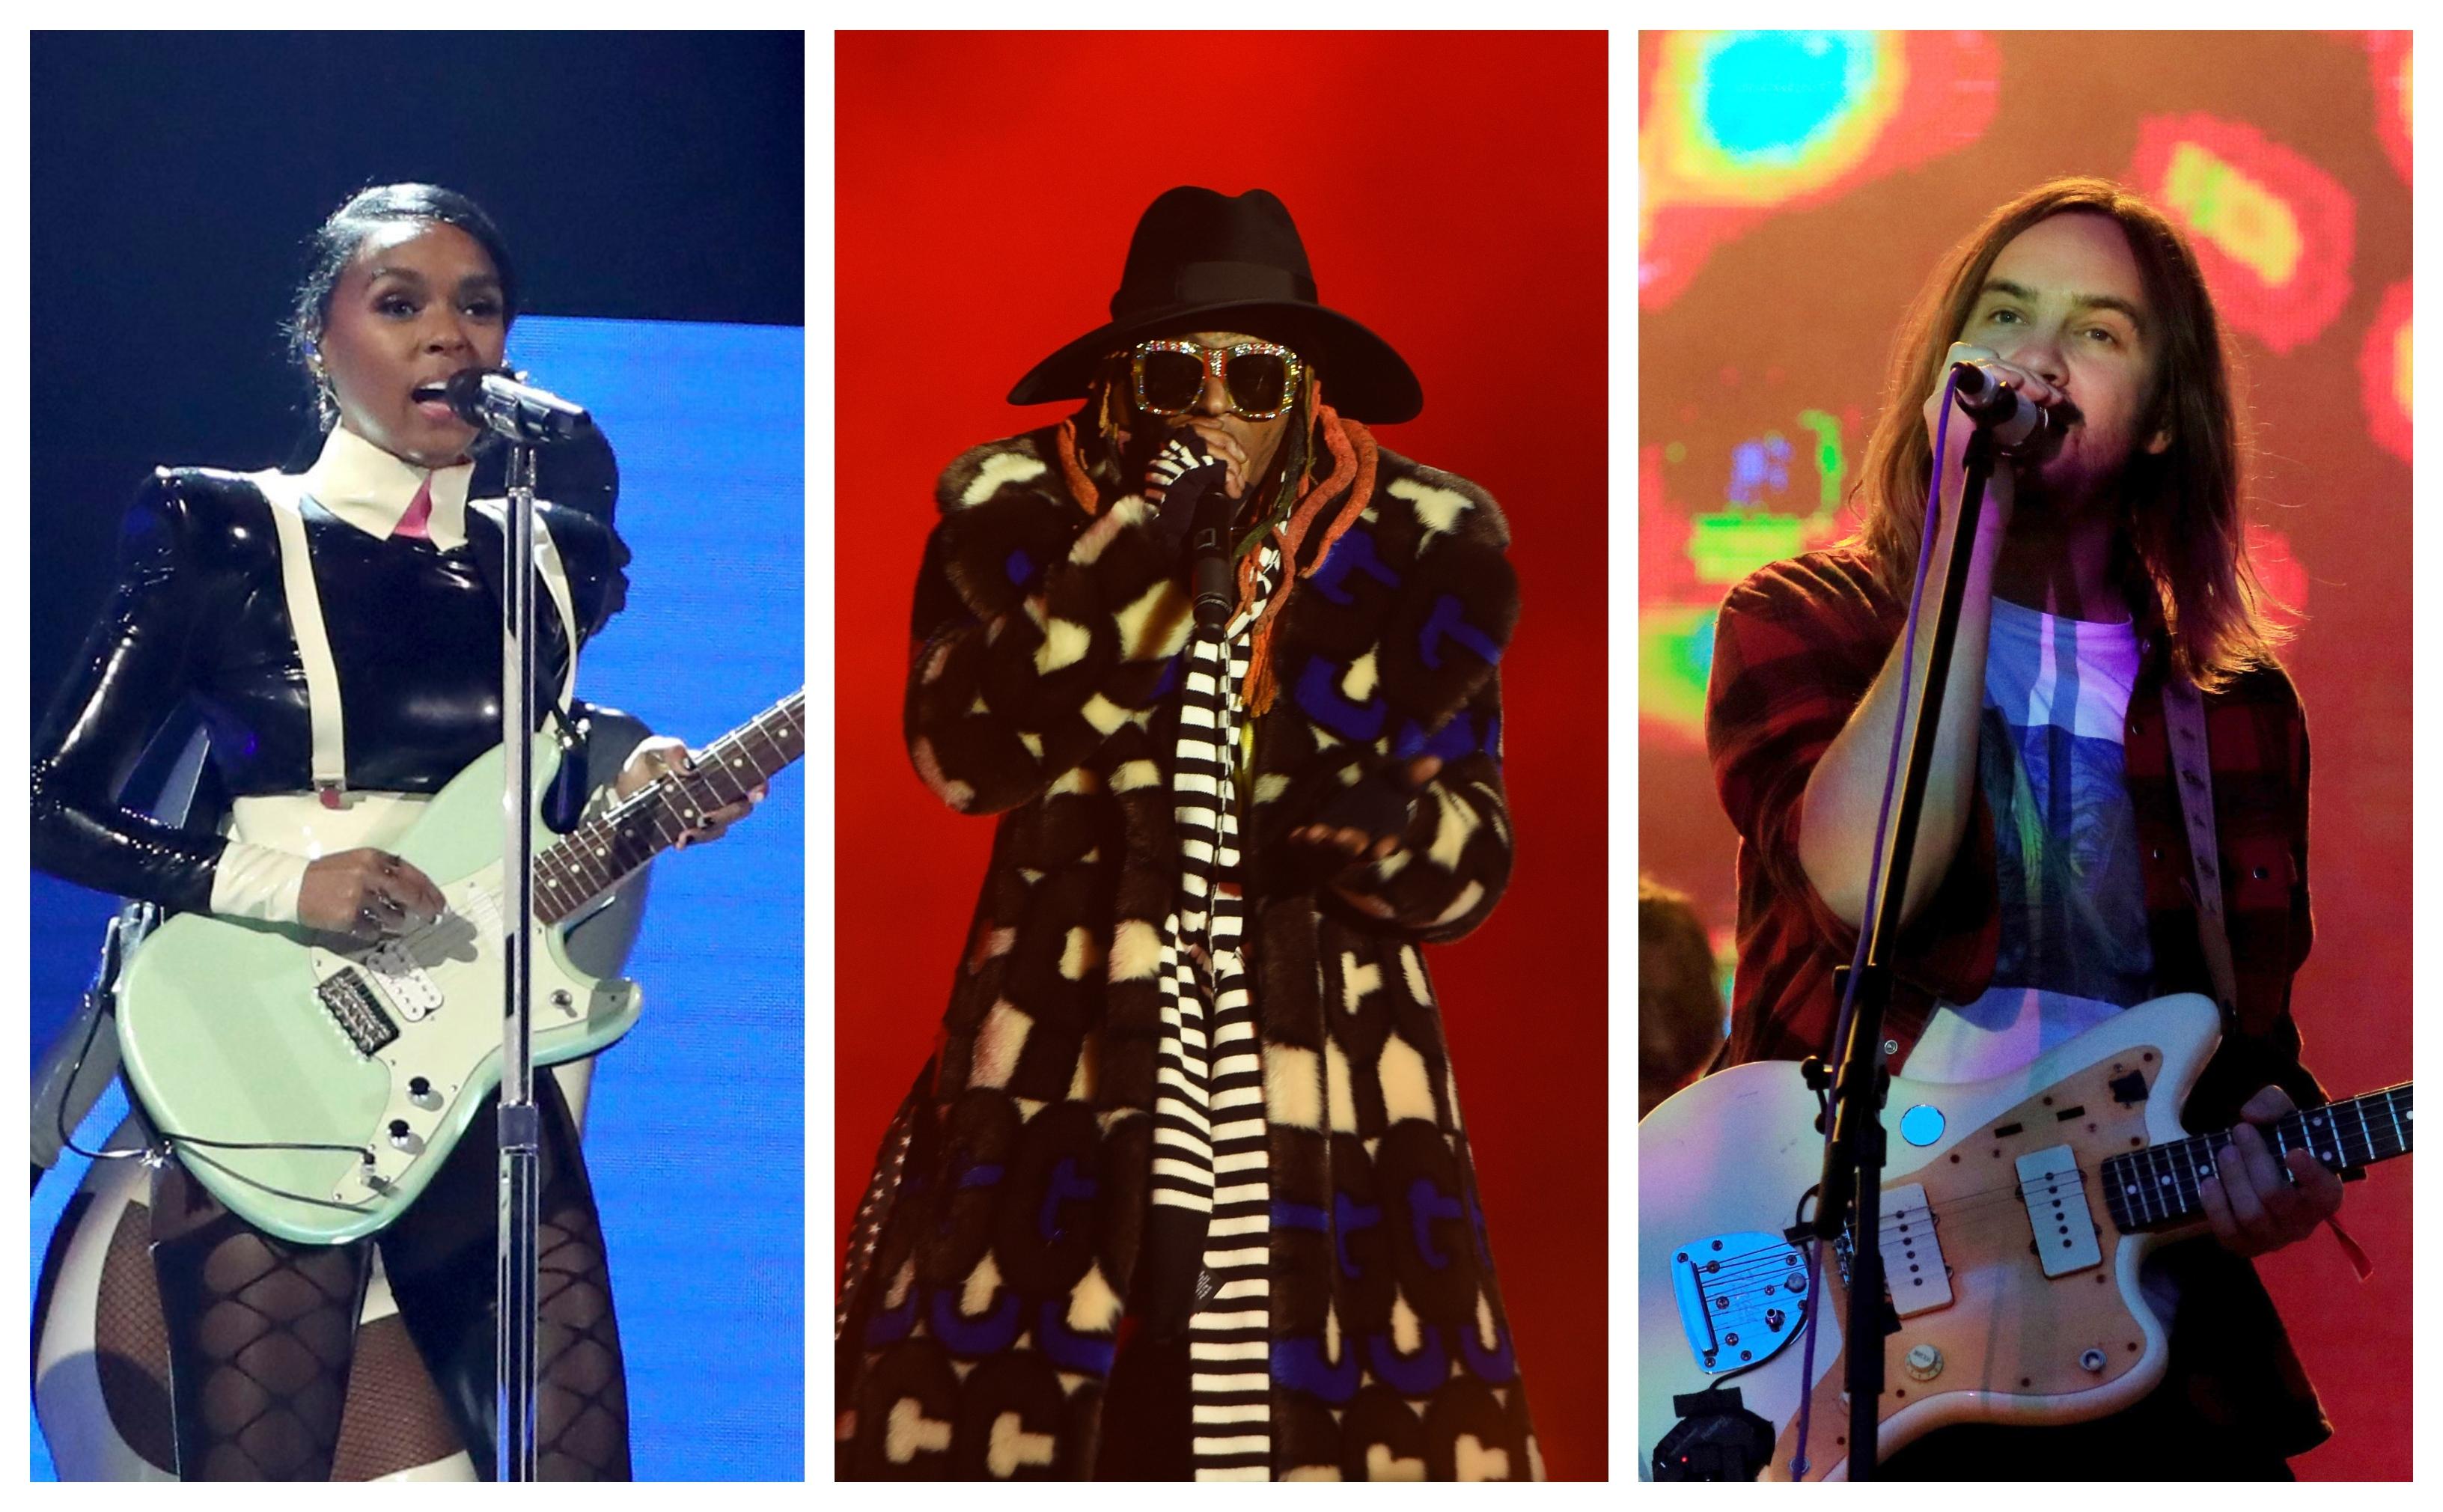 Janelle Monae, Lil Wayne Among Lollapalooza's Initial Lineup